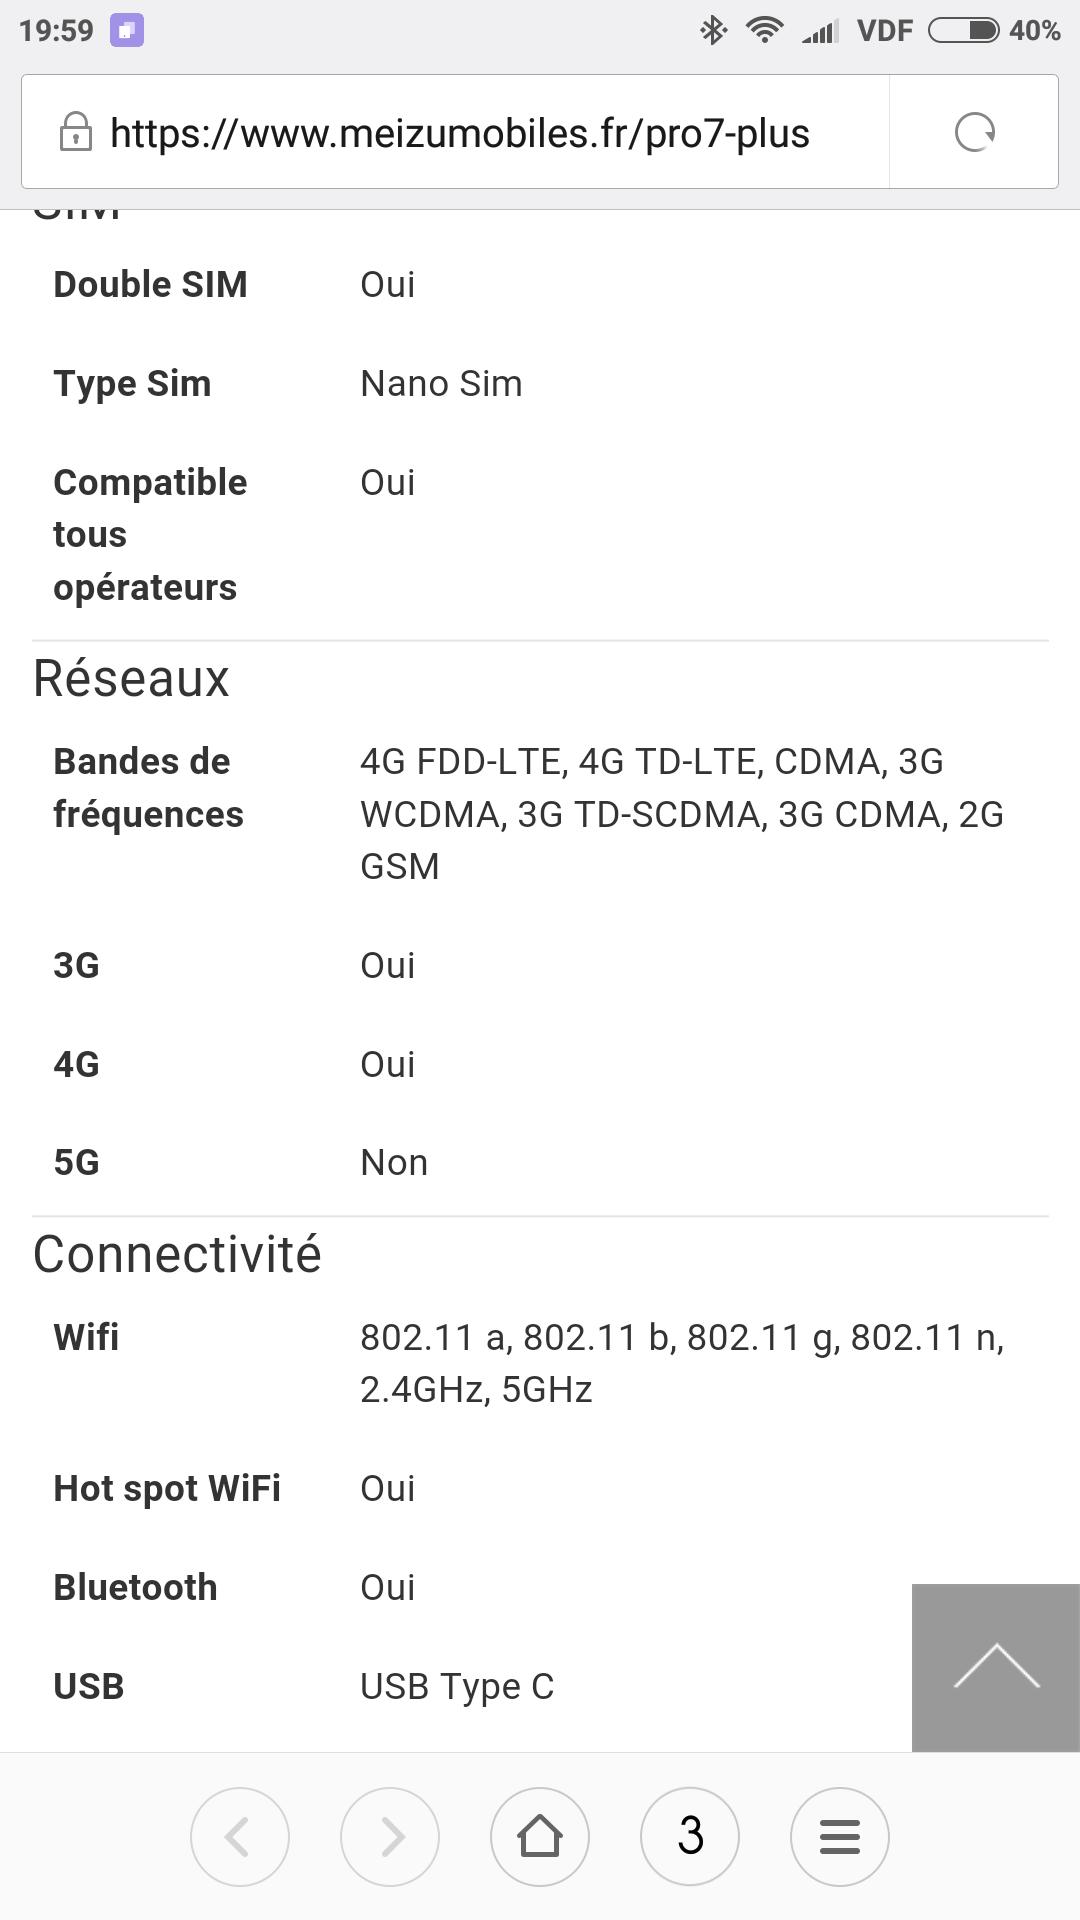 Screenshot_2017-09-06-19-59-26-701_com.android.browser.png